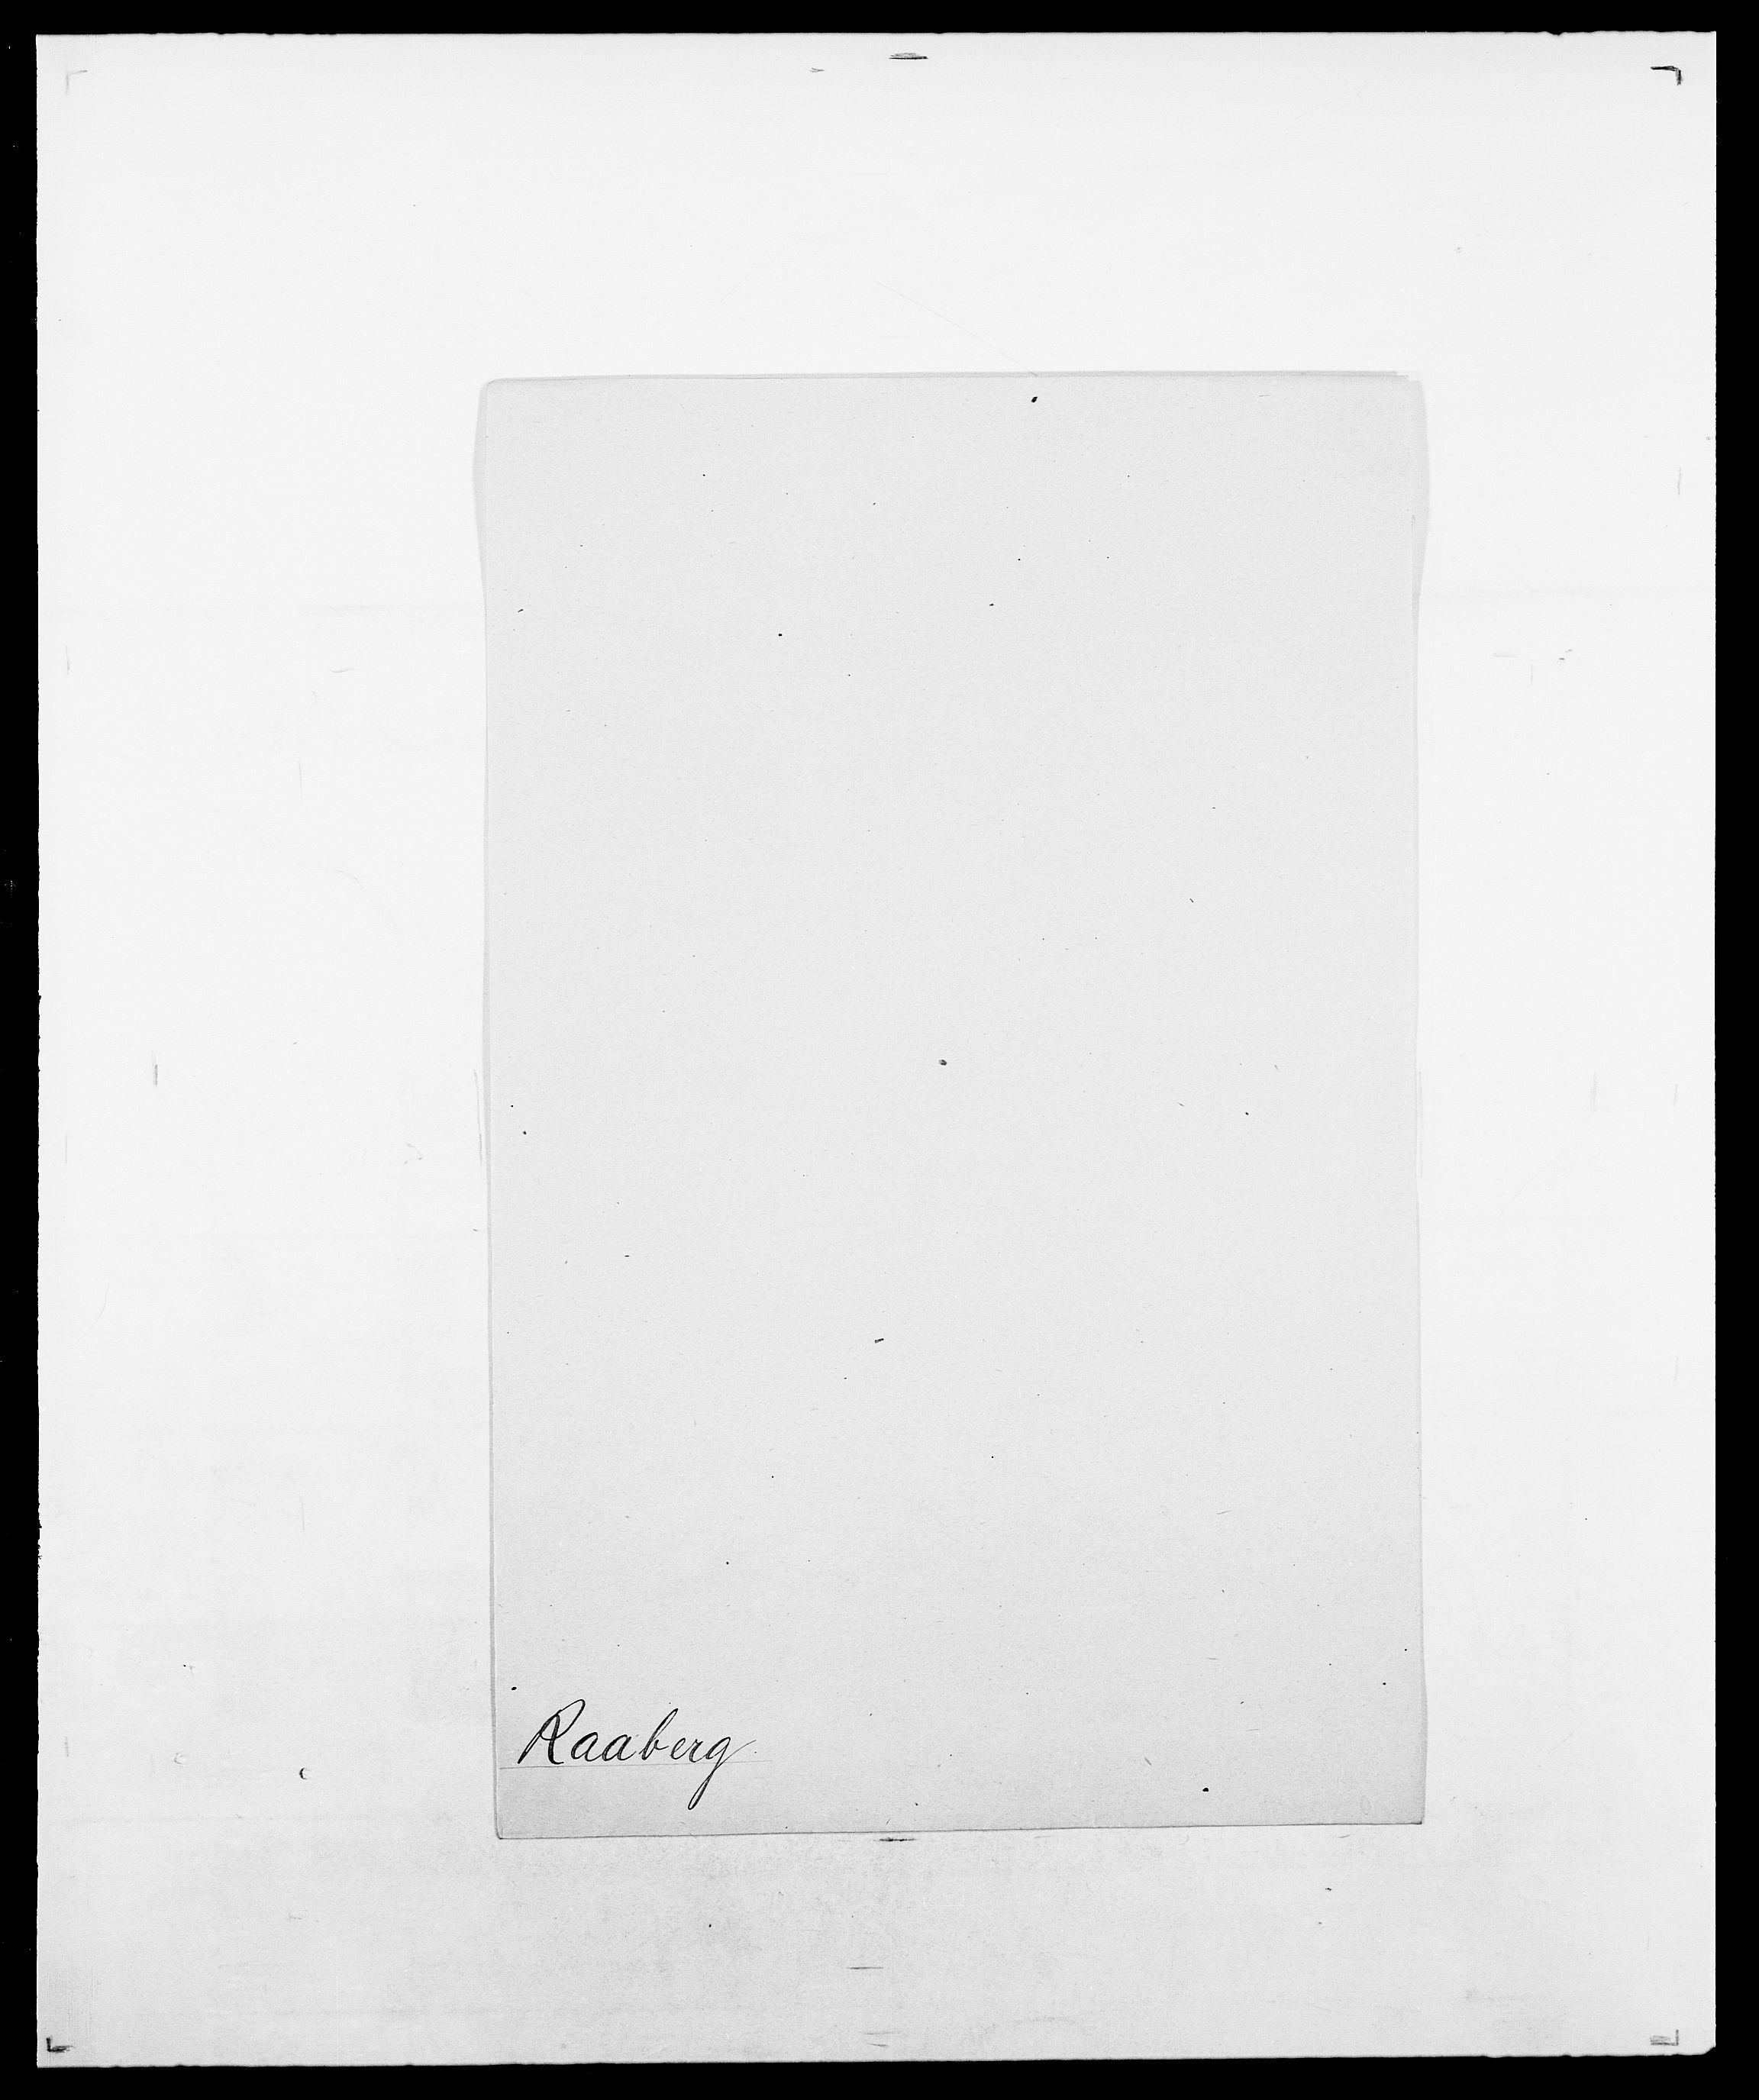 SAO, Delgobe, Charles Antoine - samling, D/Da/L0031: de Place - Raaum, s. 526